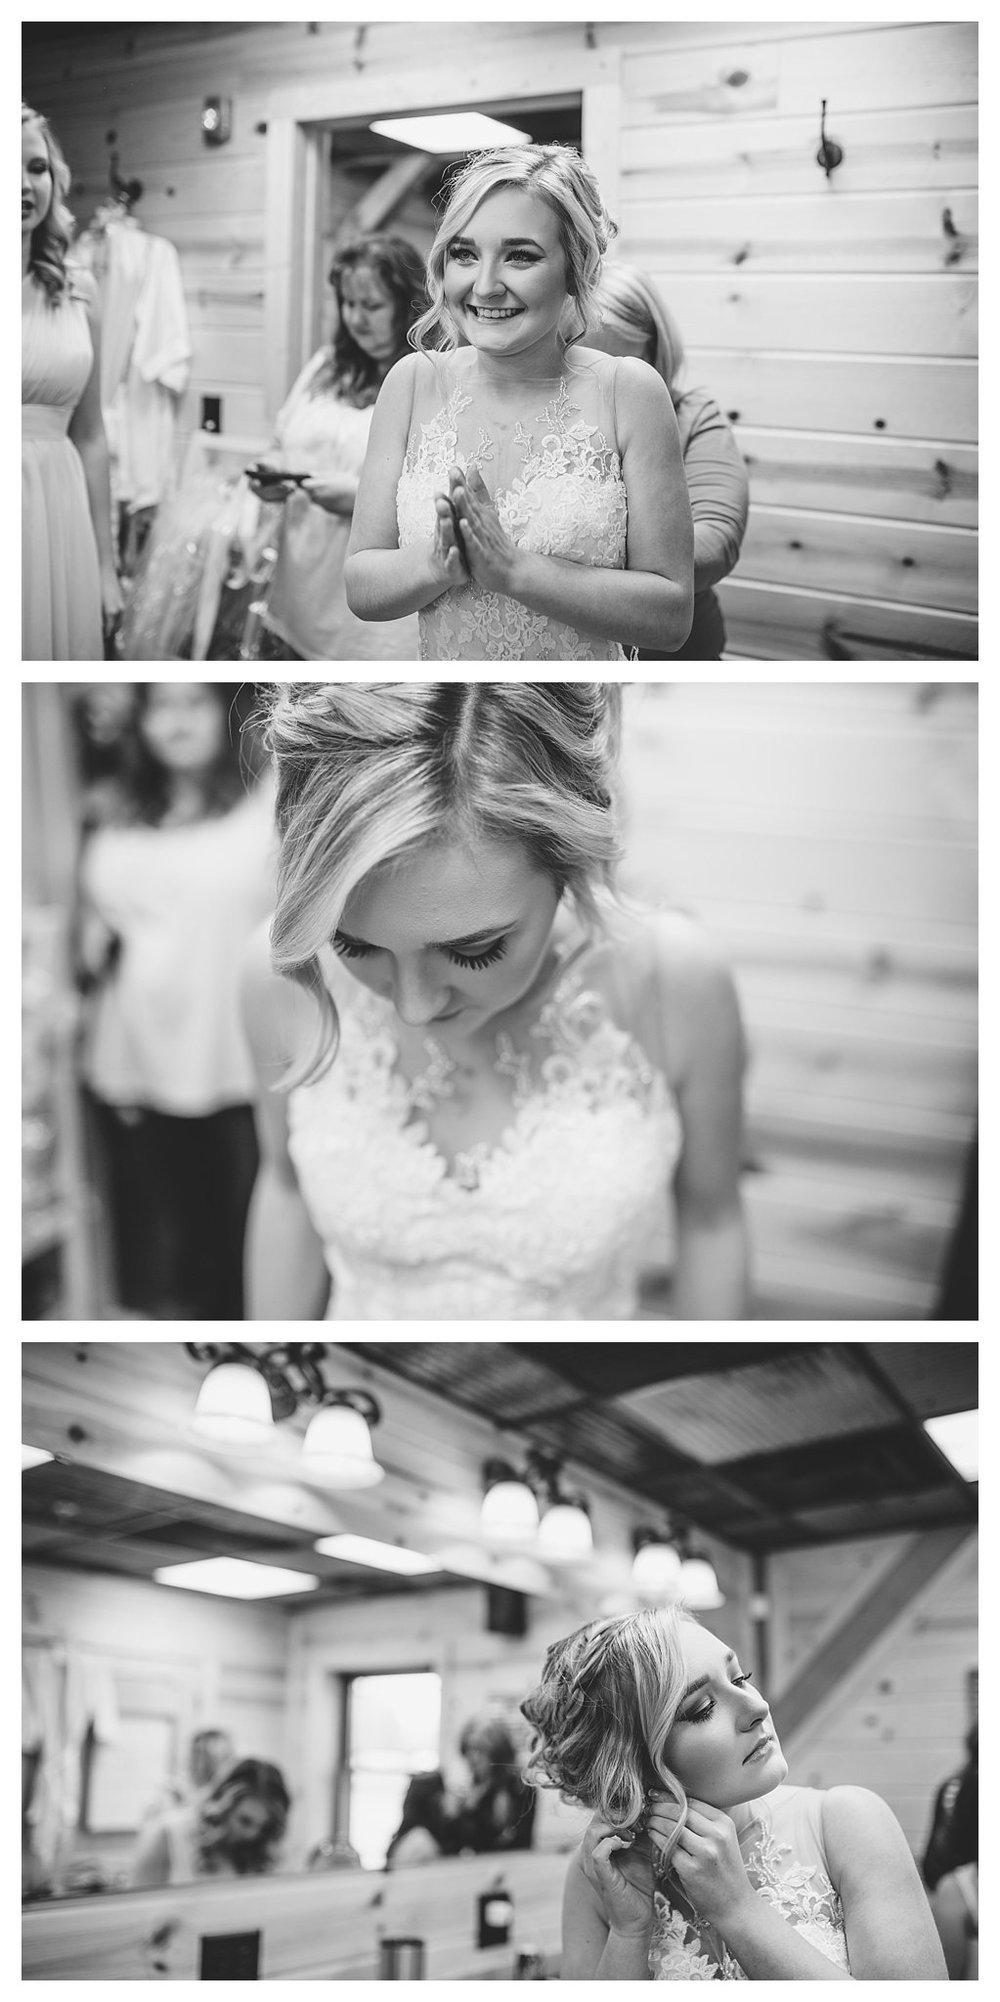 everleigh-photography-cincinnati-wedding-photographer-rolling-meadows-ranch-cincinnati-wedding-photography-wedding-photo-ideas-kristin-and-keegan07